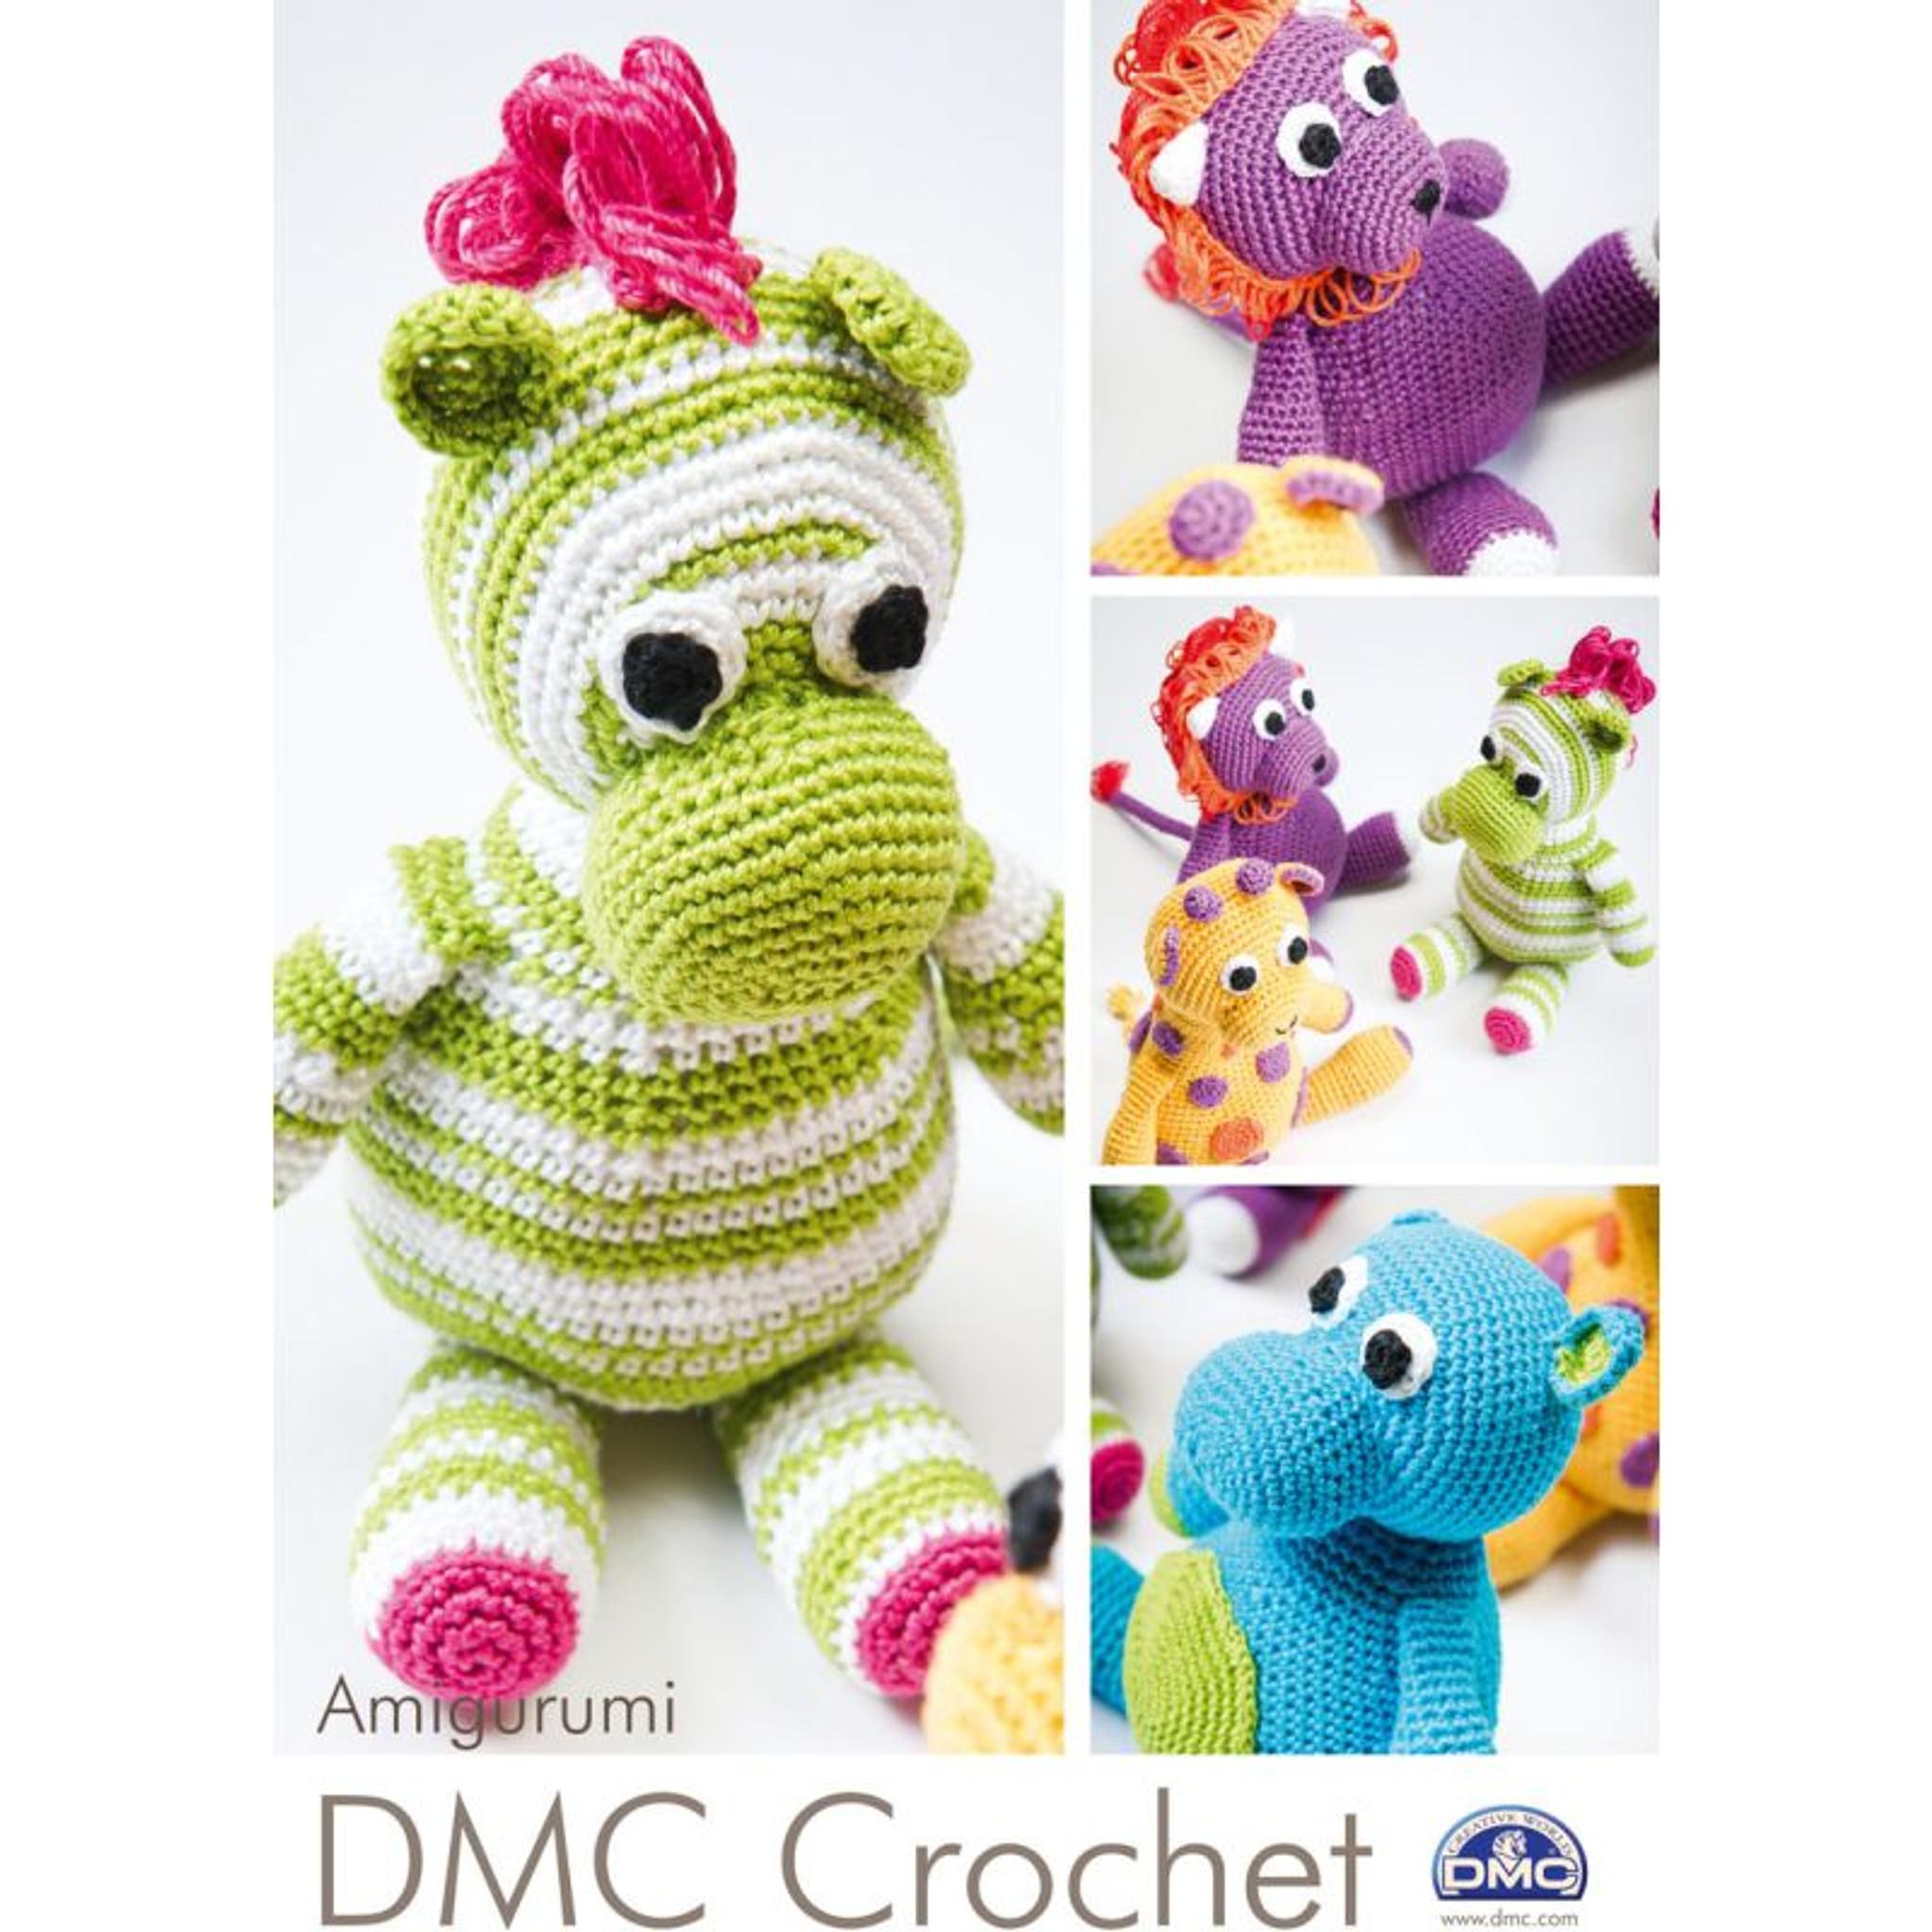 DMC Natura Crochet Pussycat Amigurumi Pattern 15440 Needlecraft ... | 2048x2048